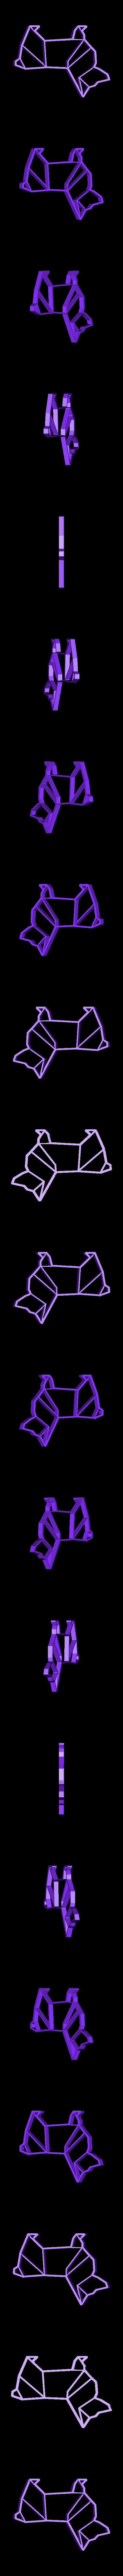 customized_origami_corgi.stl Download free STL file Customizable Origami Corgi Dog • 3D printer object, MightyNozzle